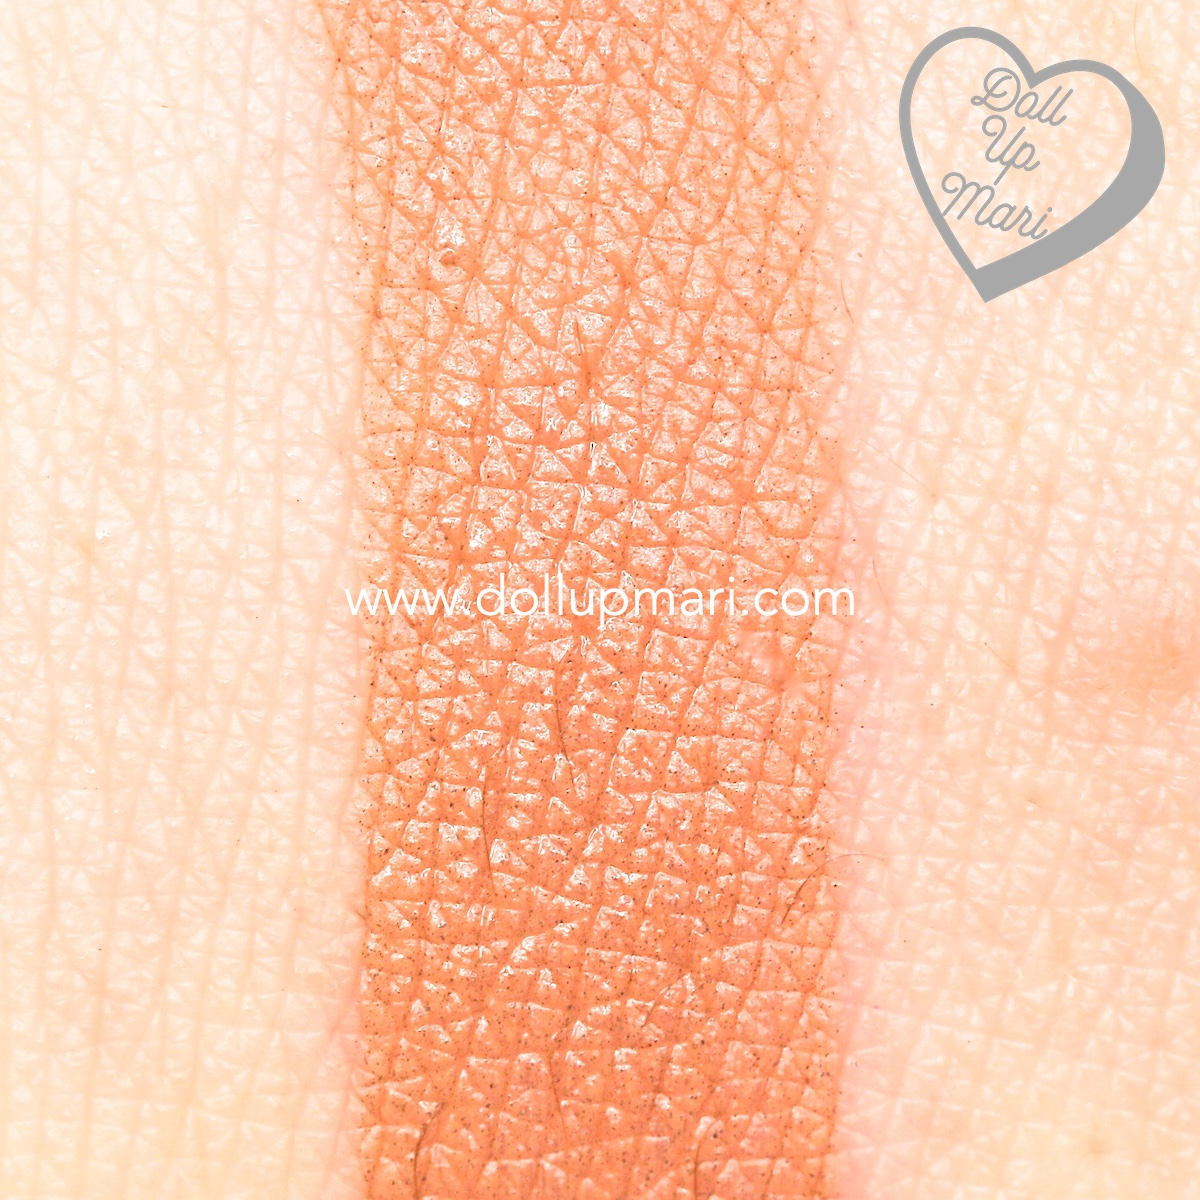 Maybelline Sensational Effects Liquid Eyeshadow M02 Clay-zy In Love Swatch